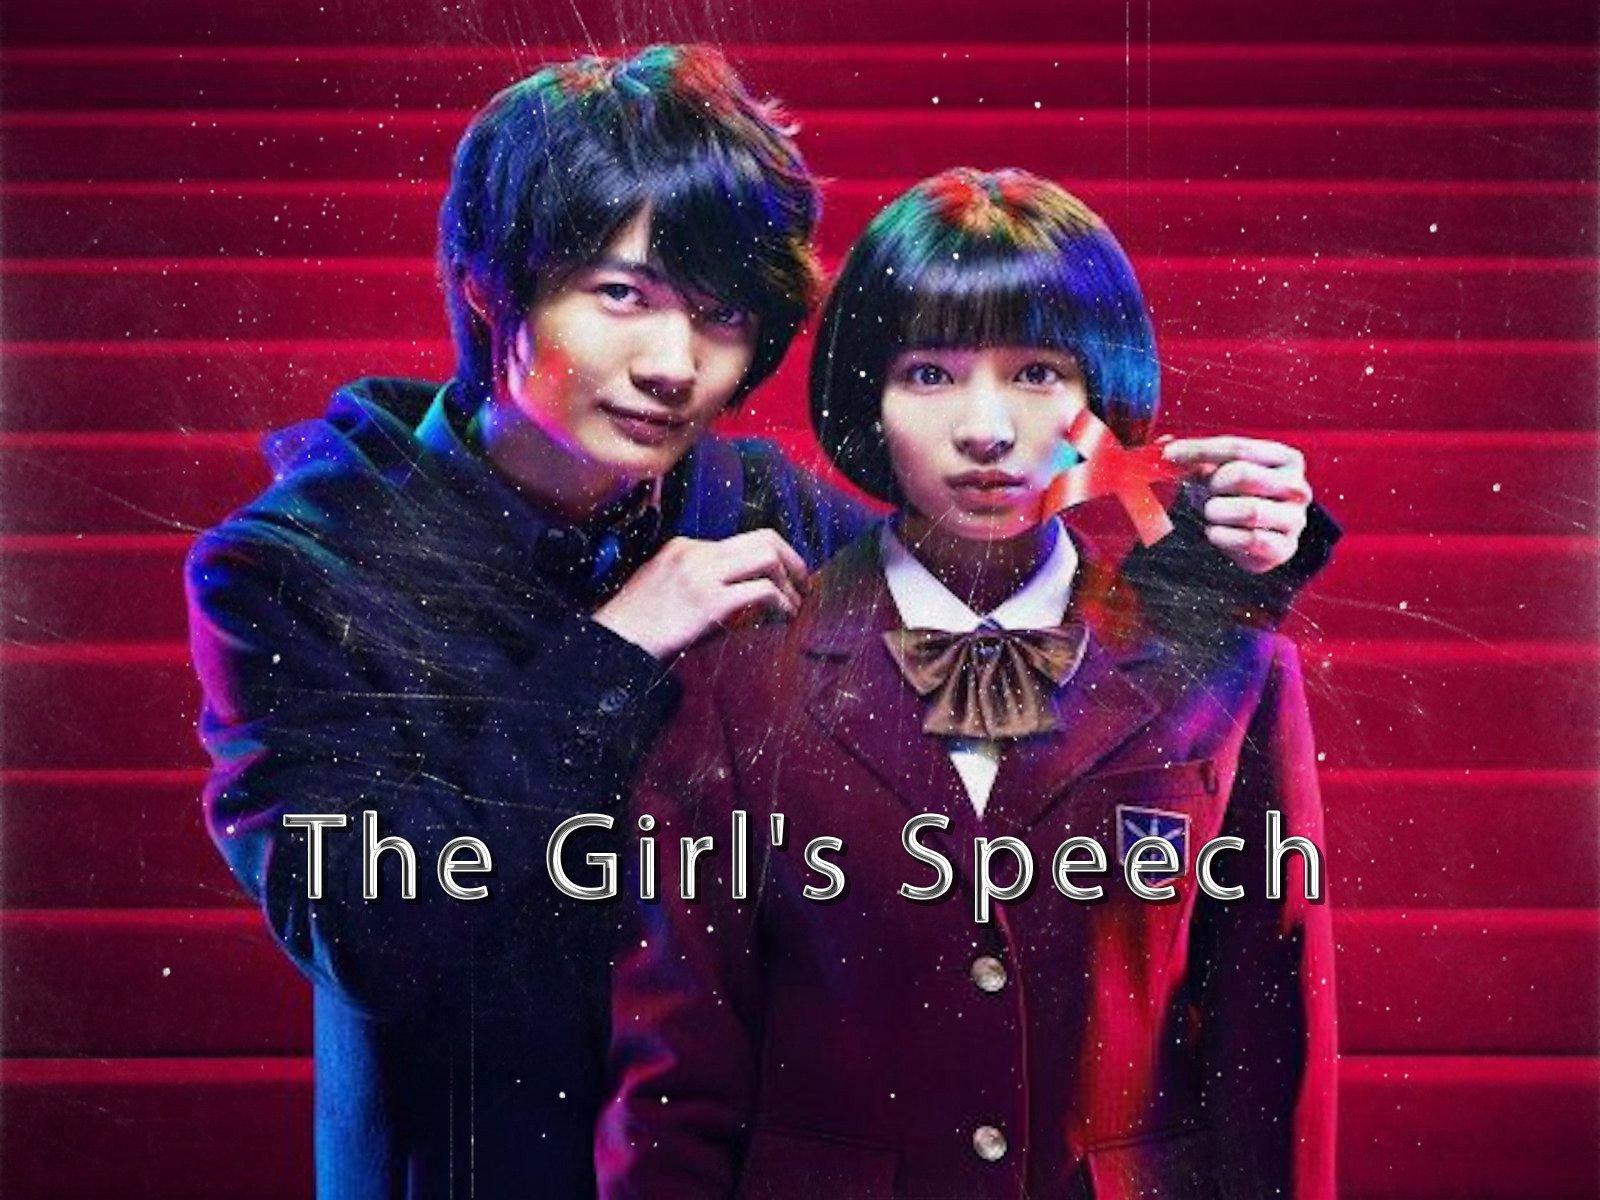 The Girl's Speech - Season 1